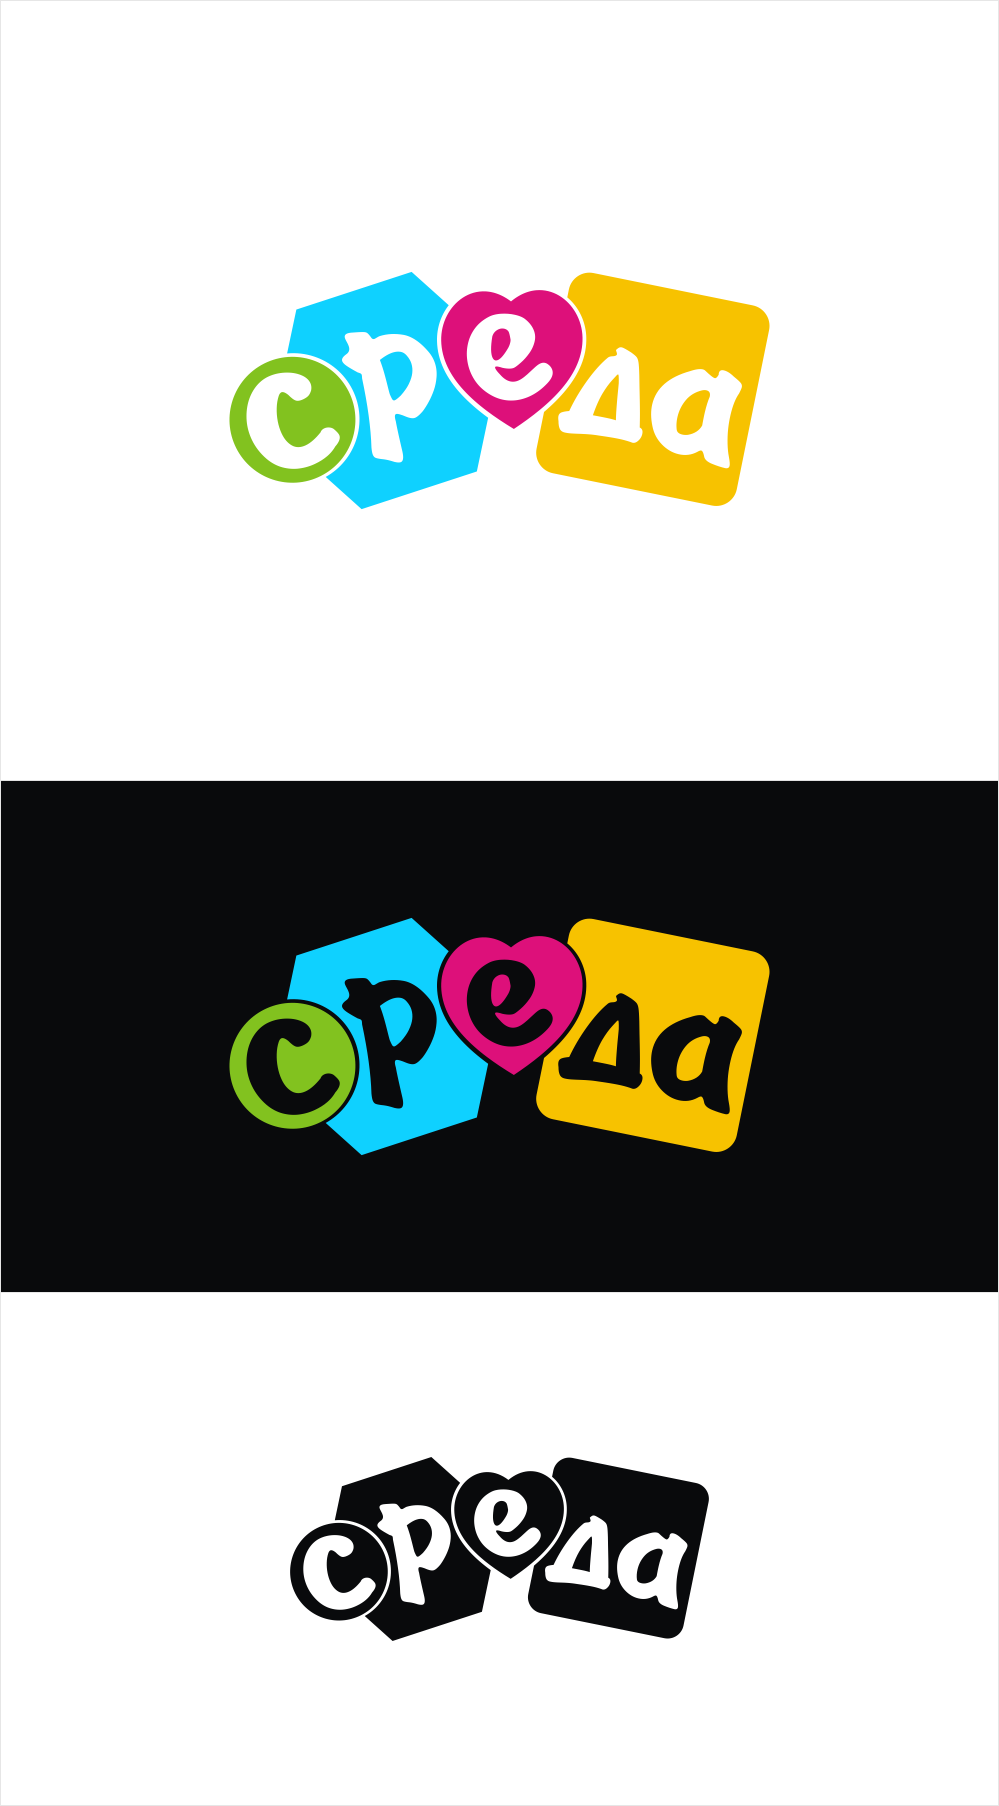 Разработка логотипа для творческого портала фото f_4085b5169888dad4.png